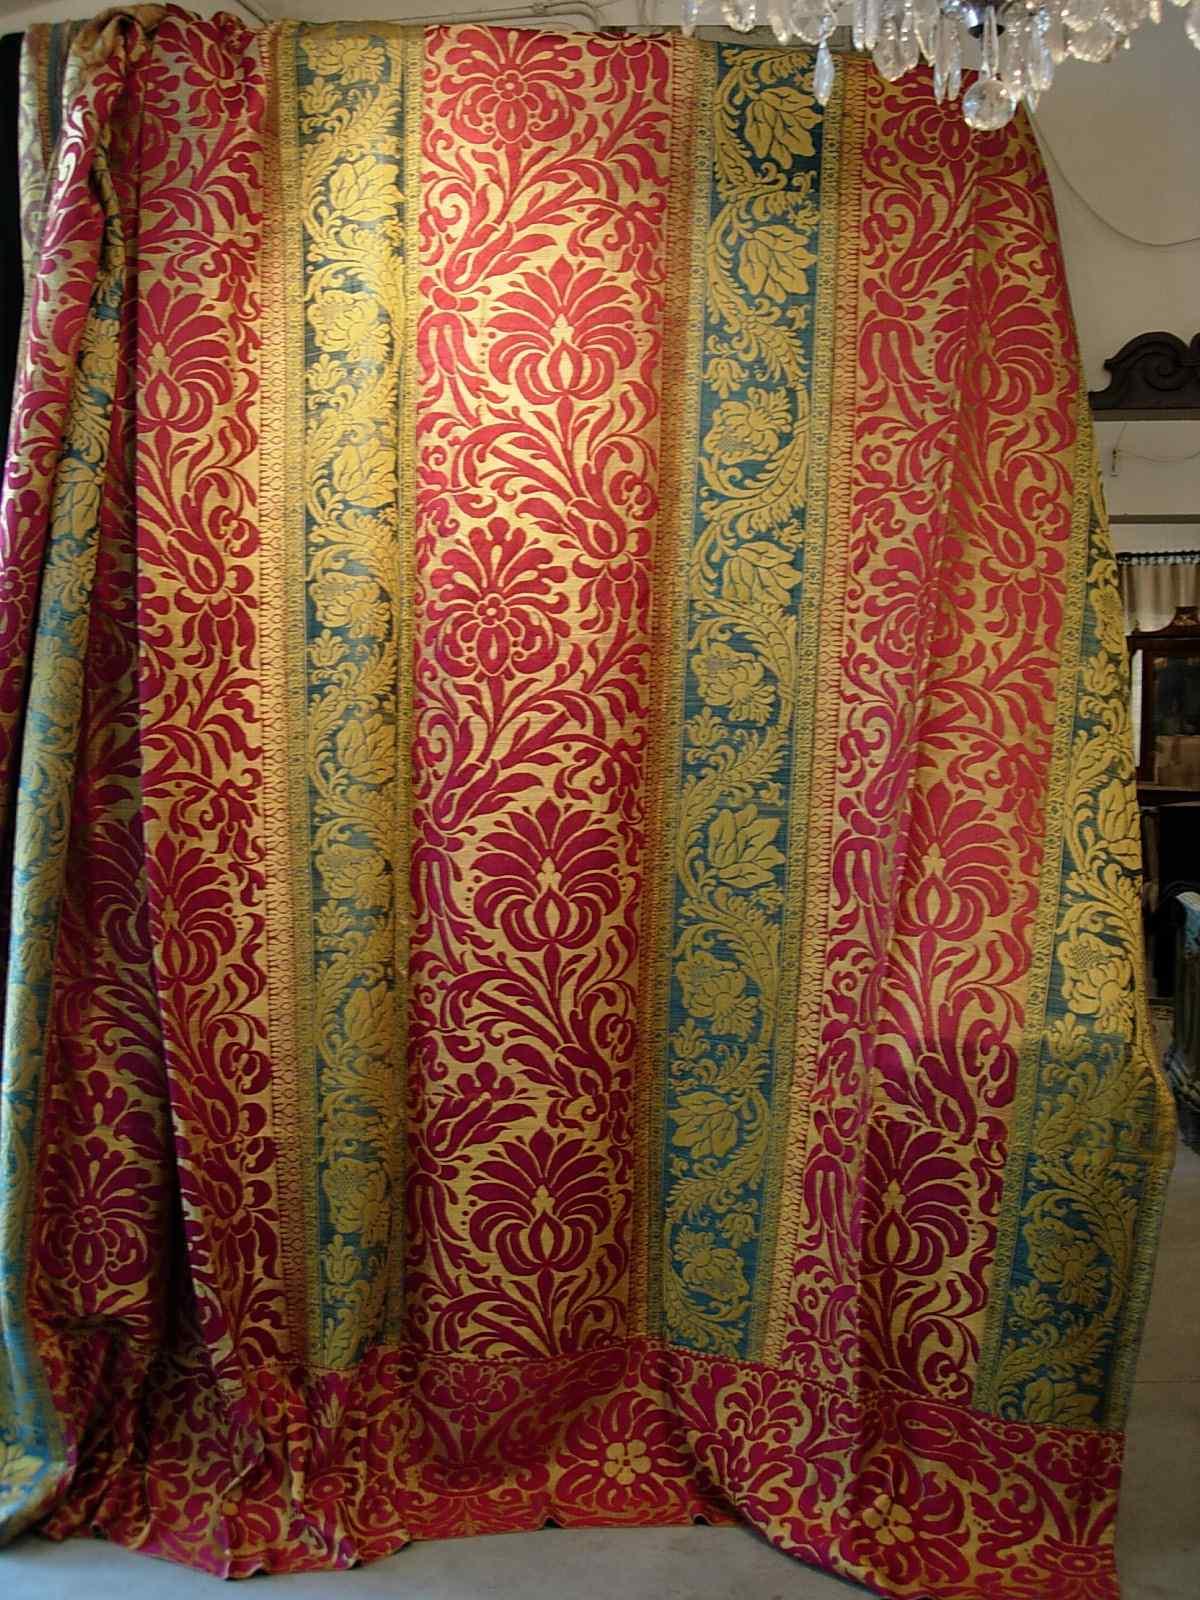 Parade fabrics, Lucca, Sec. XVII